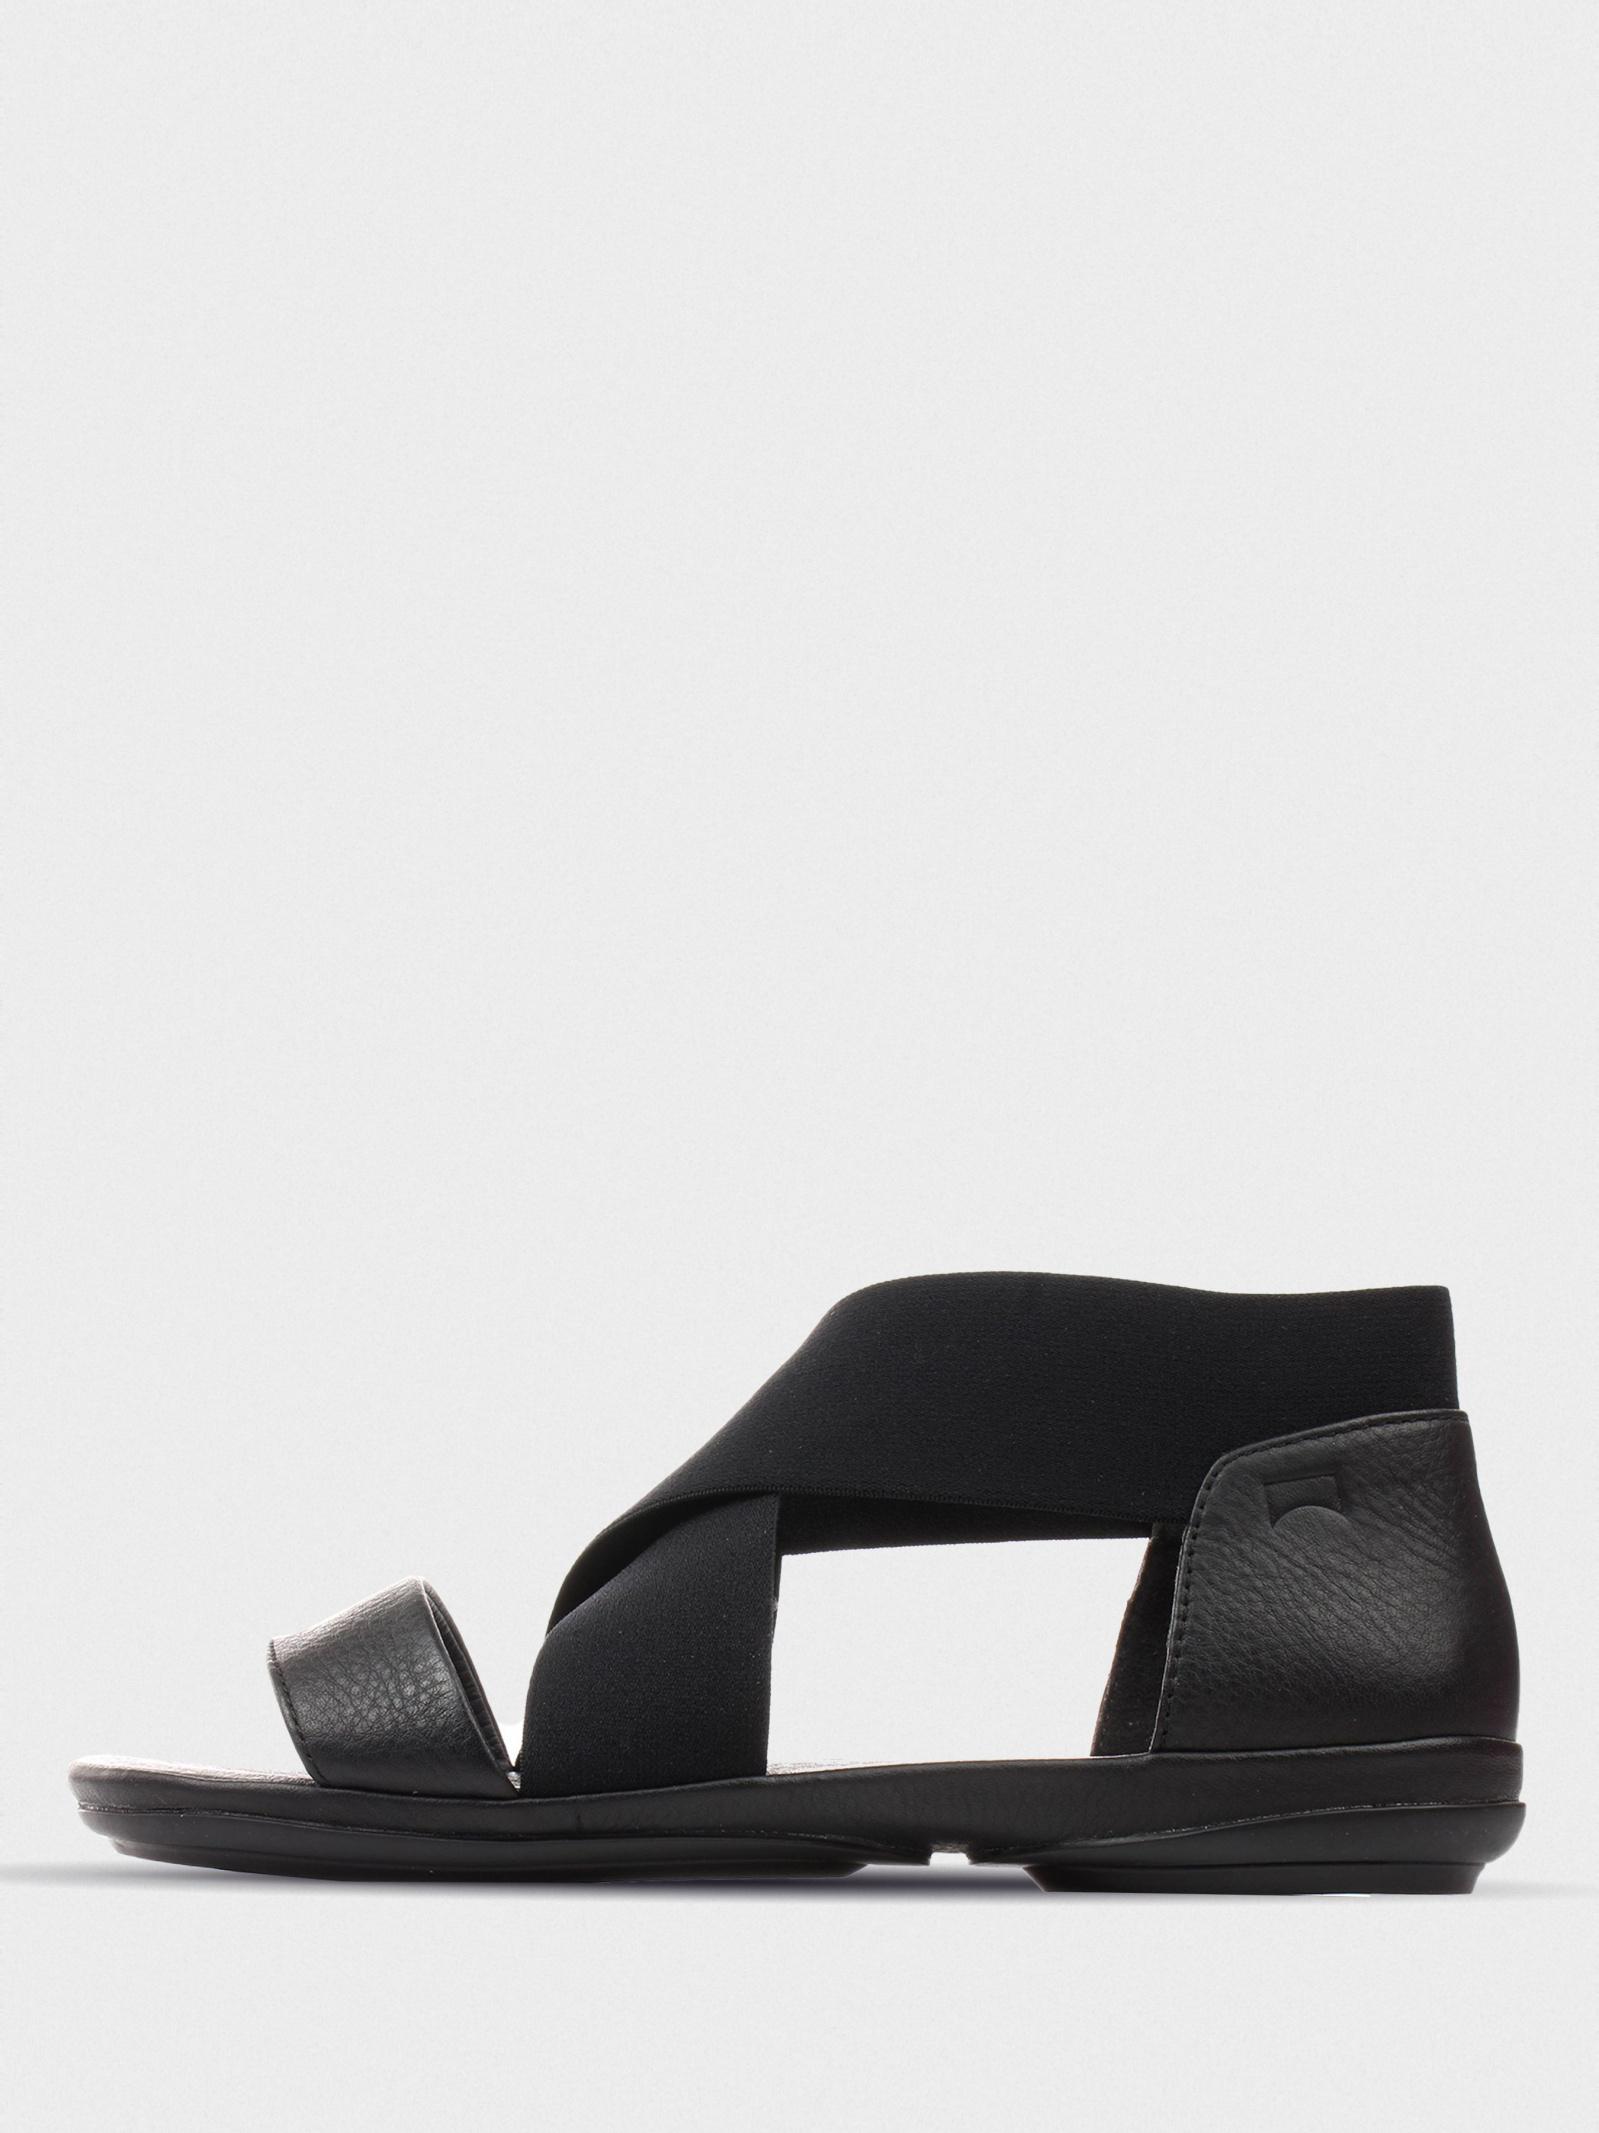 Сандалии женские Camper Right Nina AW1117 размеры обуви, 2017